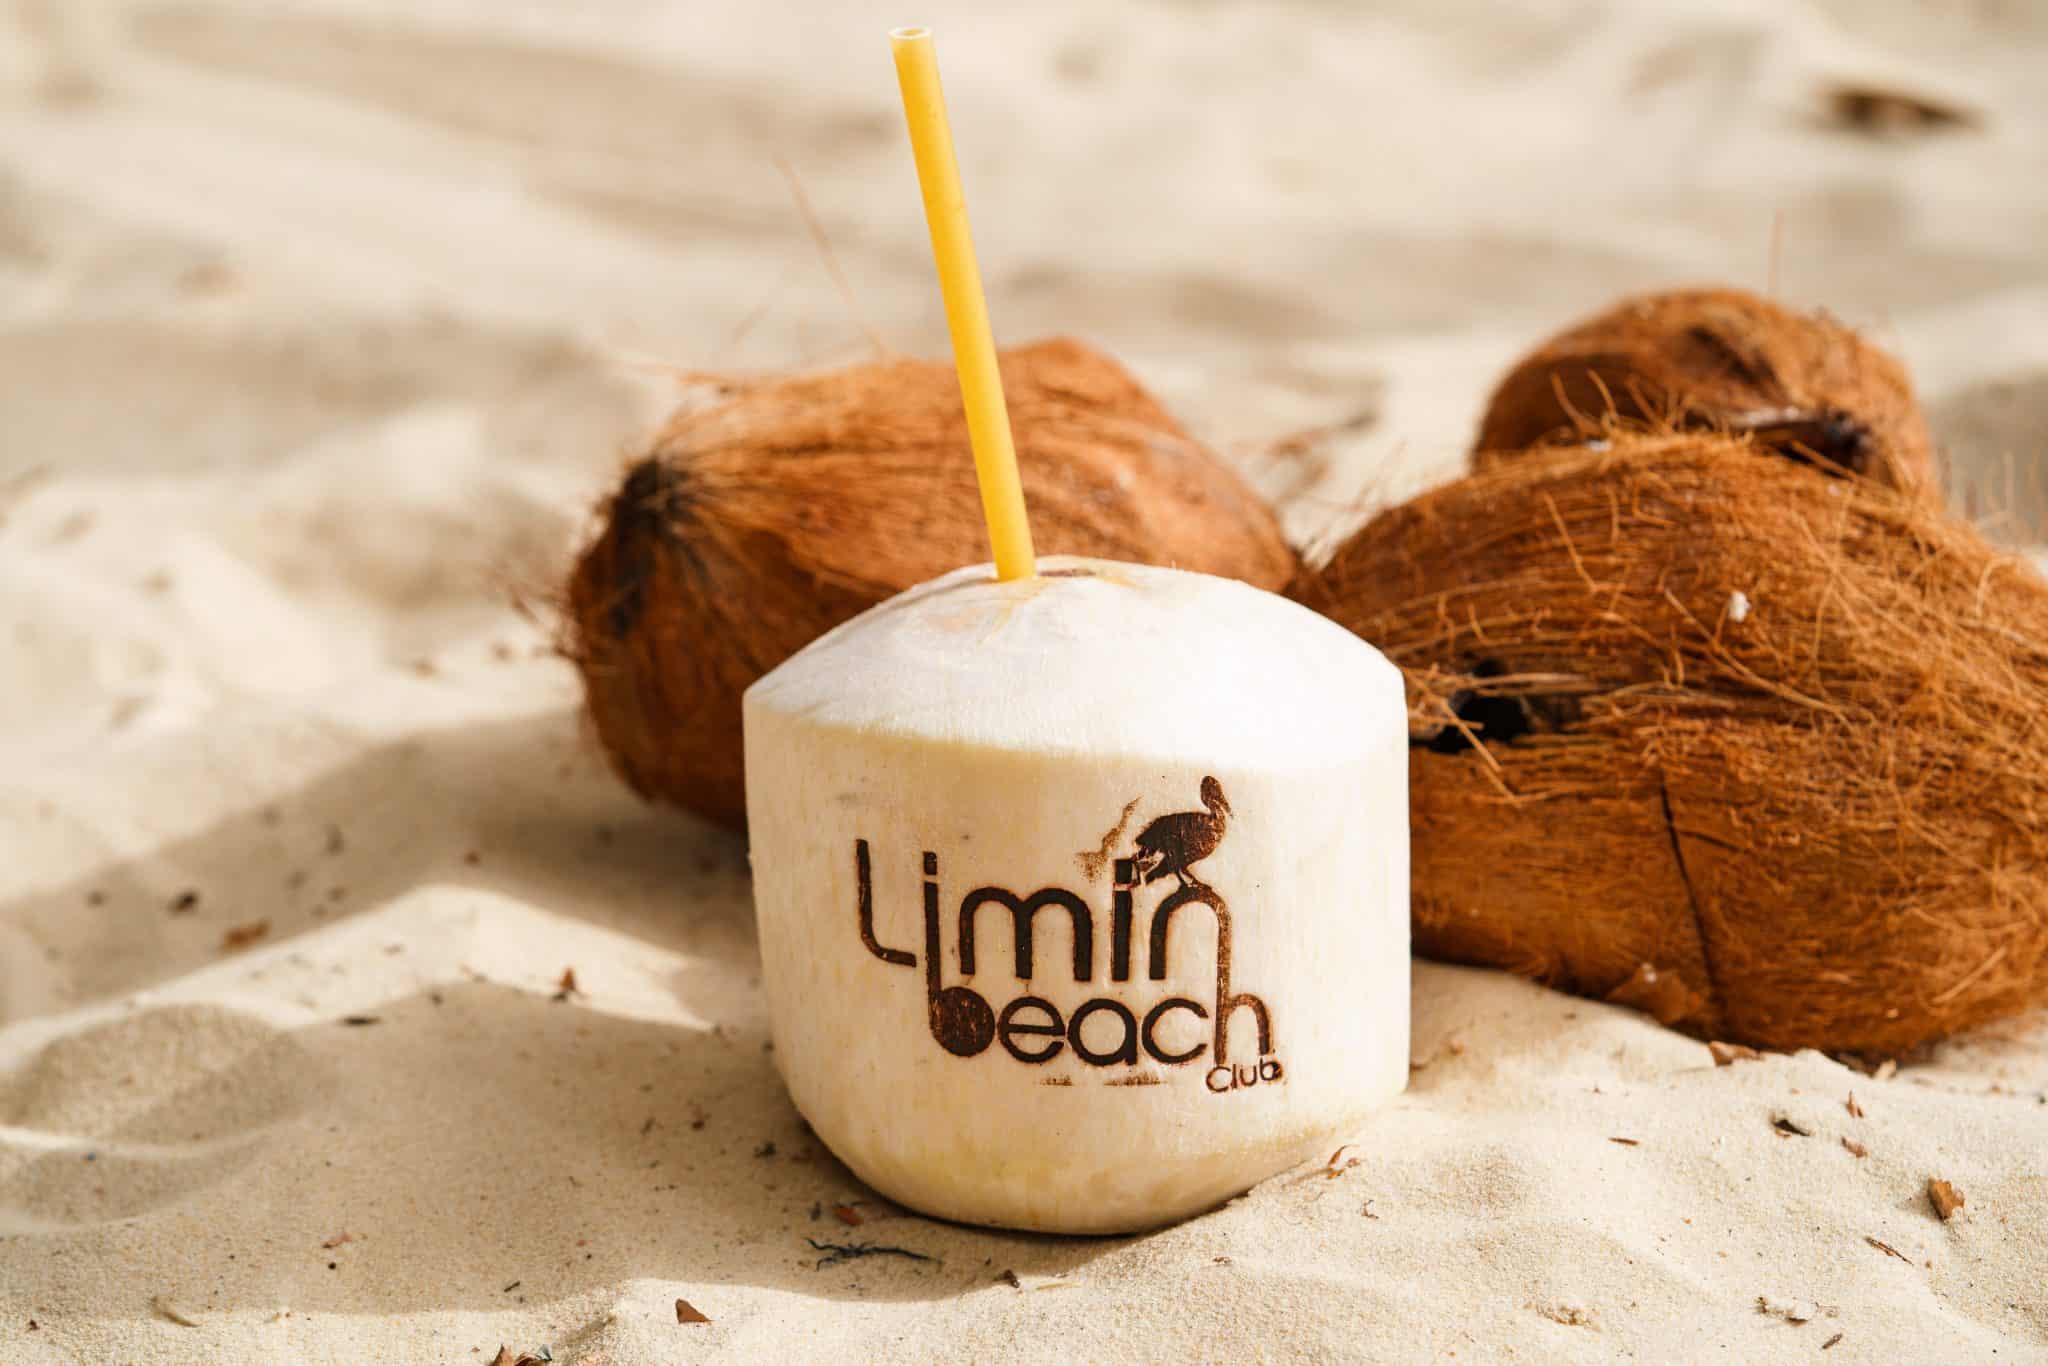 Limin' Beach Club Coconut